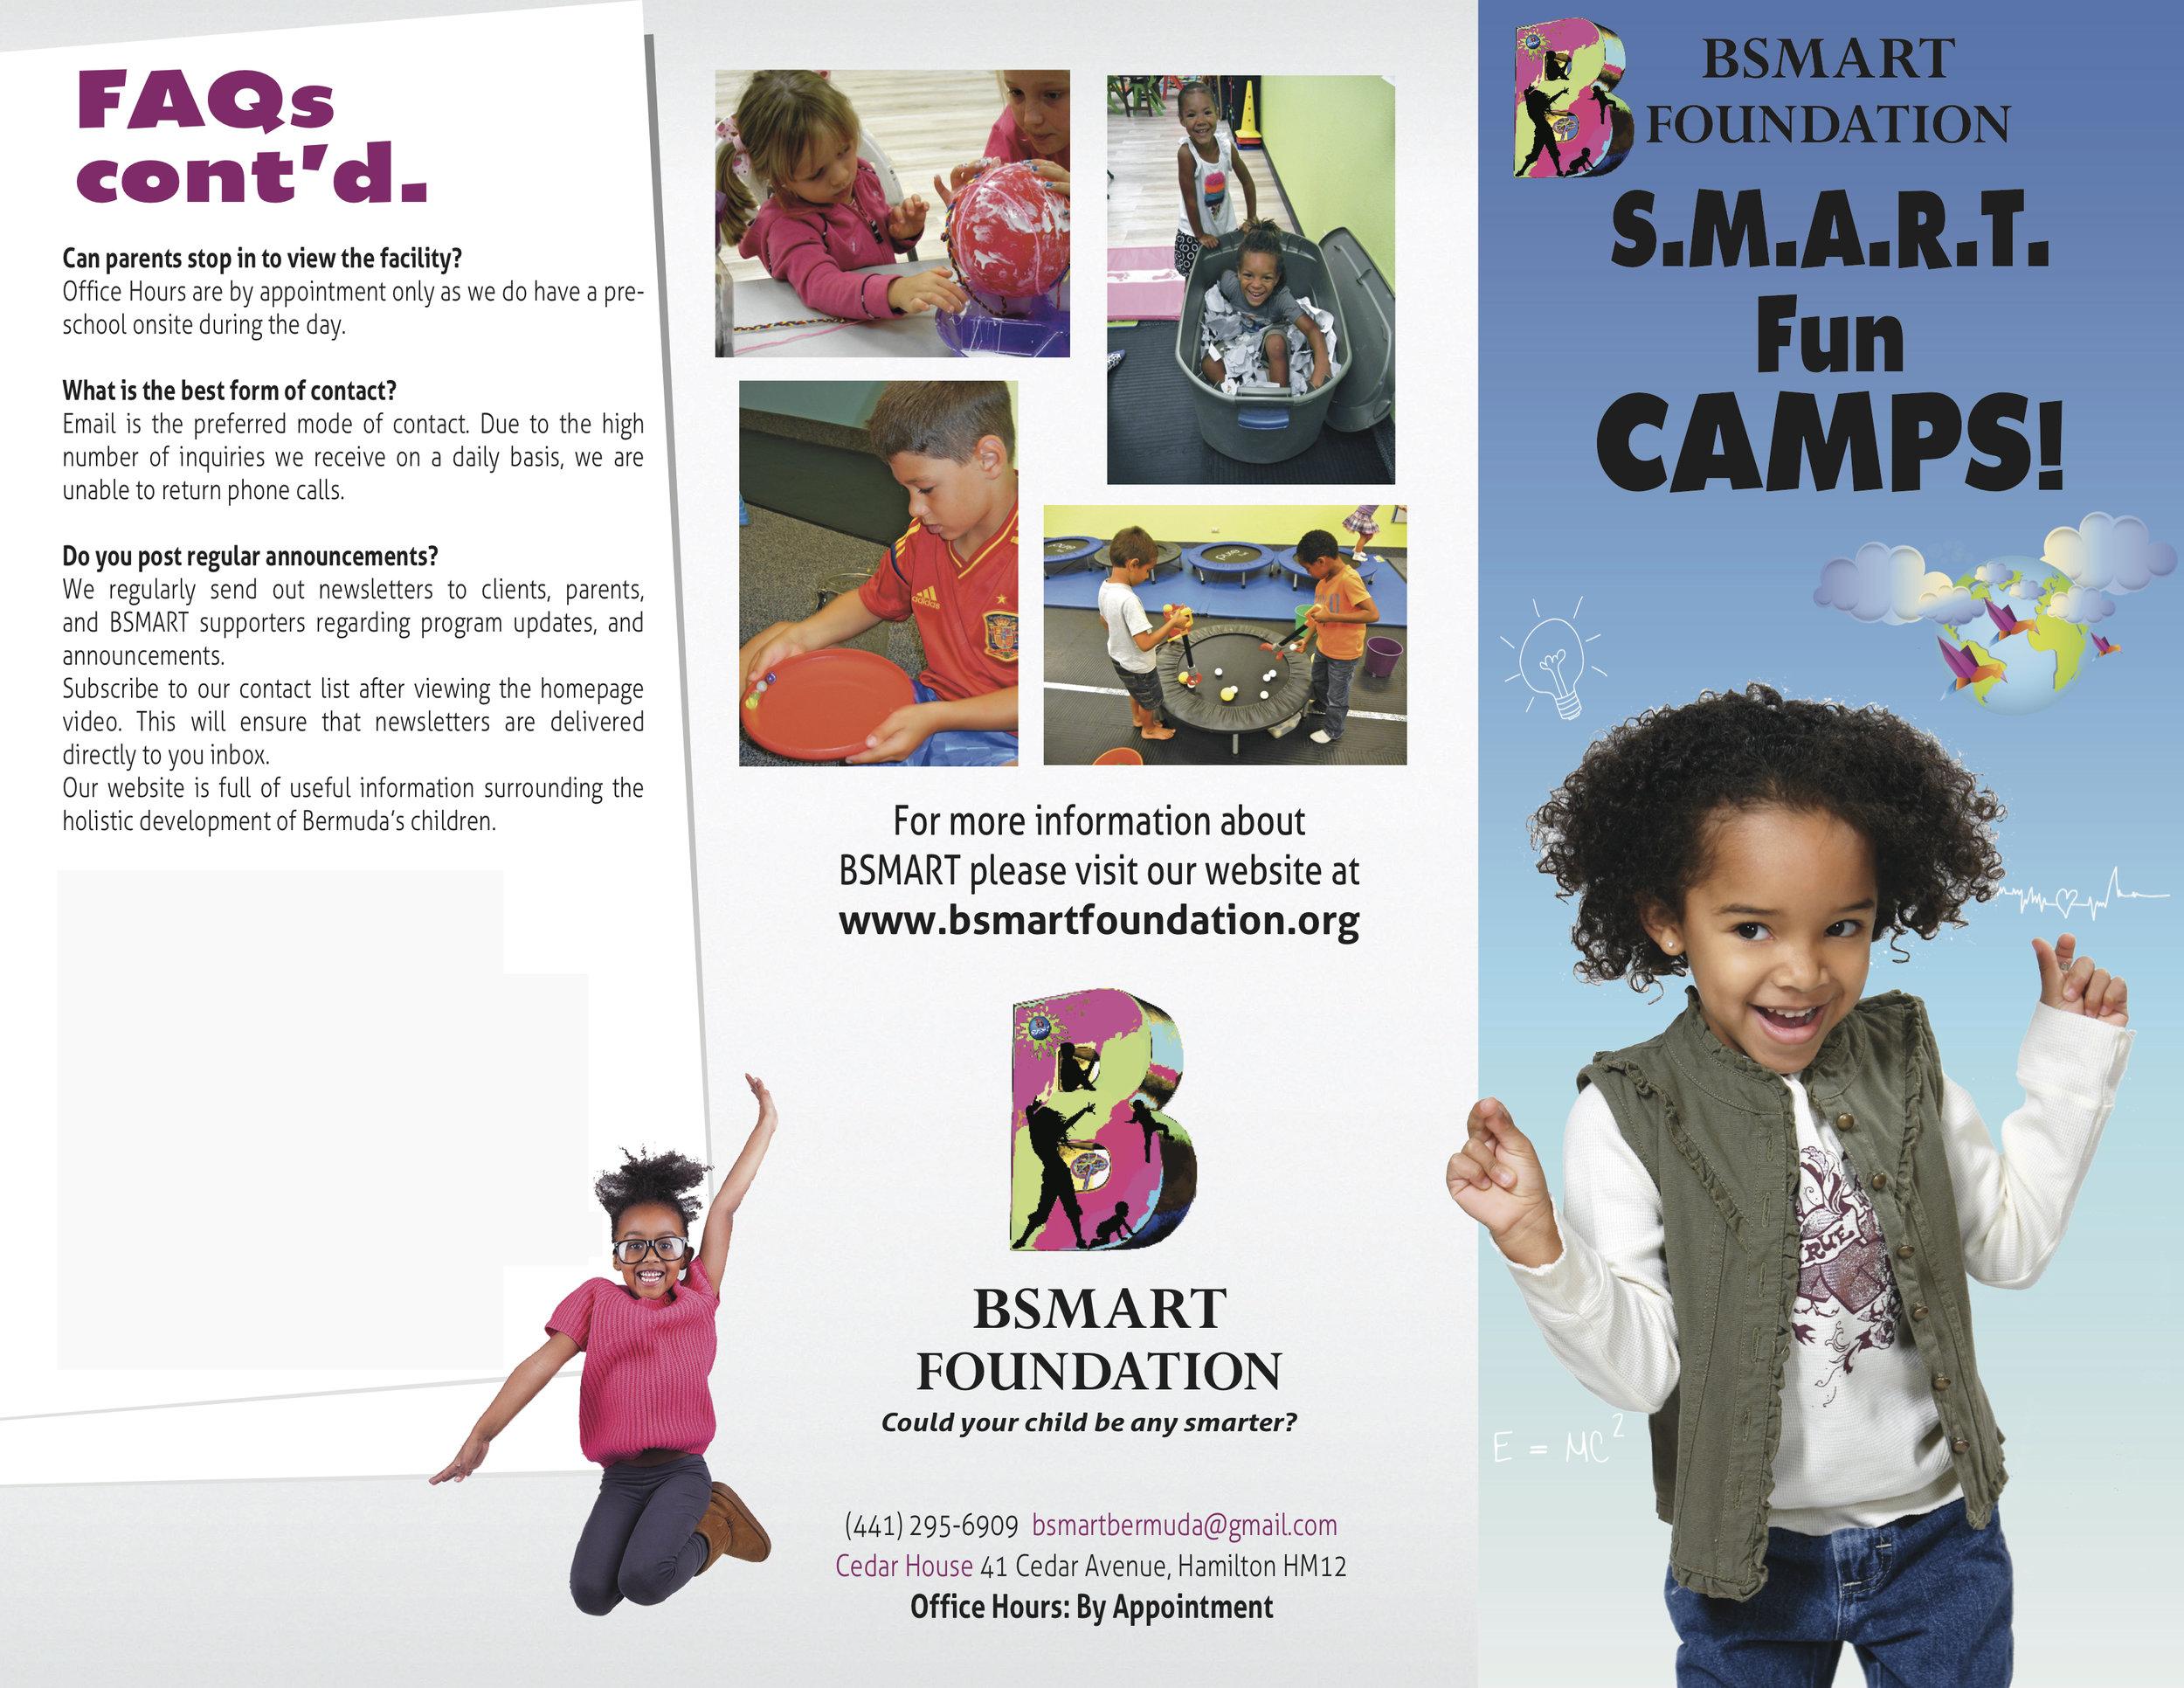 BSMART Fun Camp Brochure_updated 2018p1.jpg